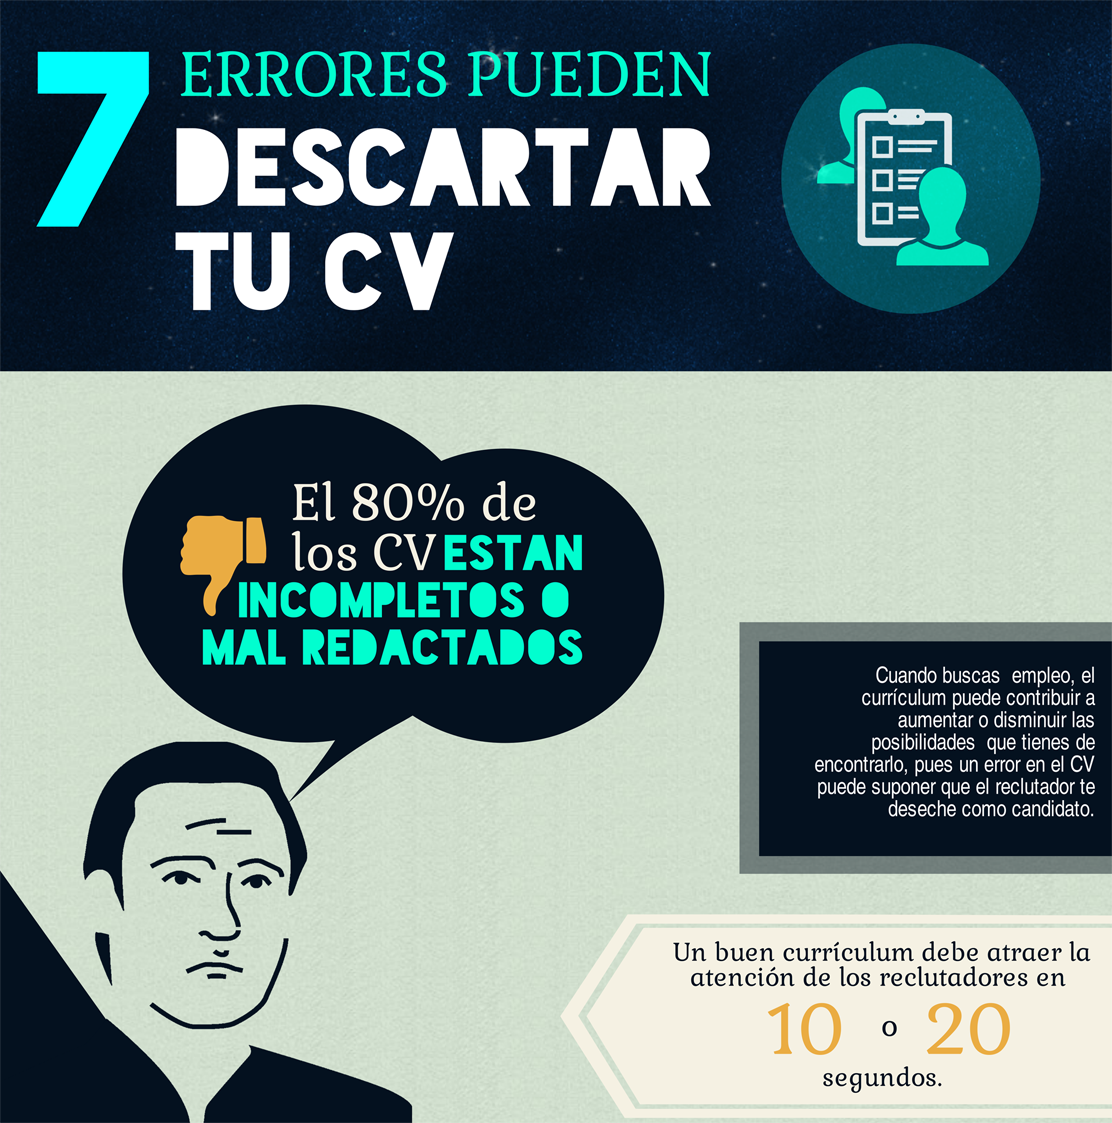 7 errores pueden descartar tu curriculum